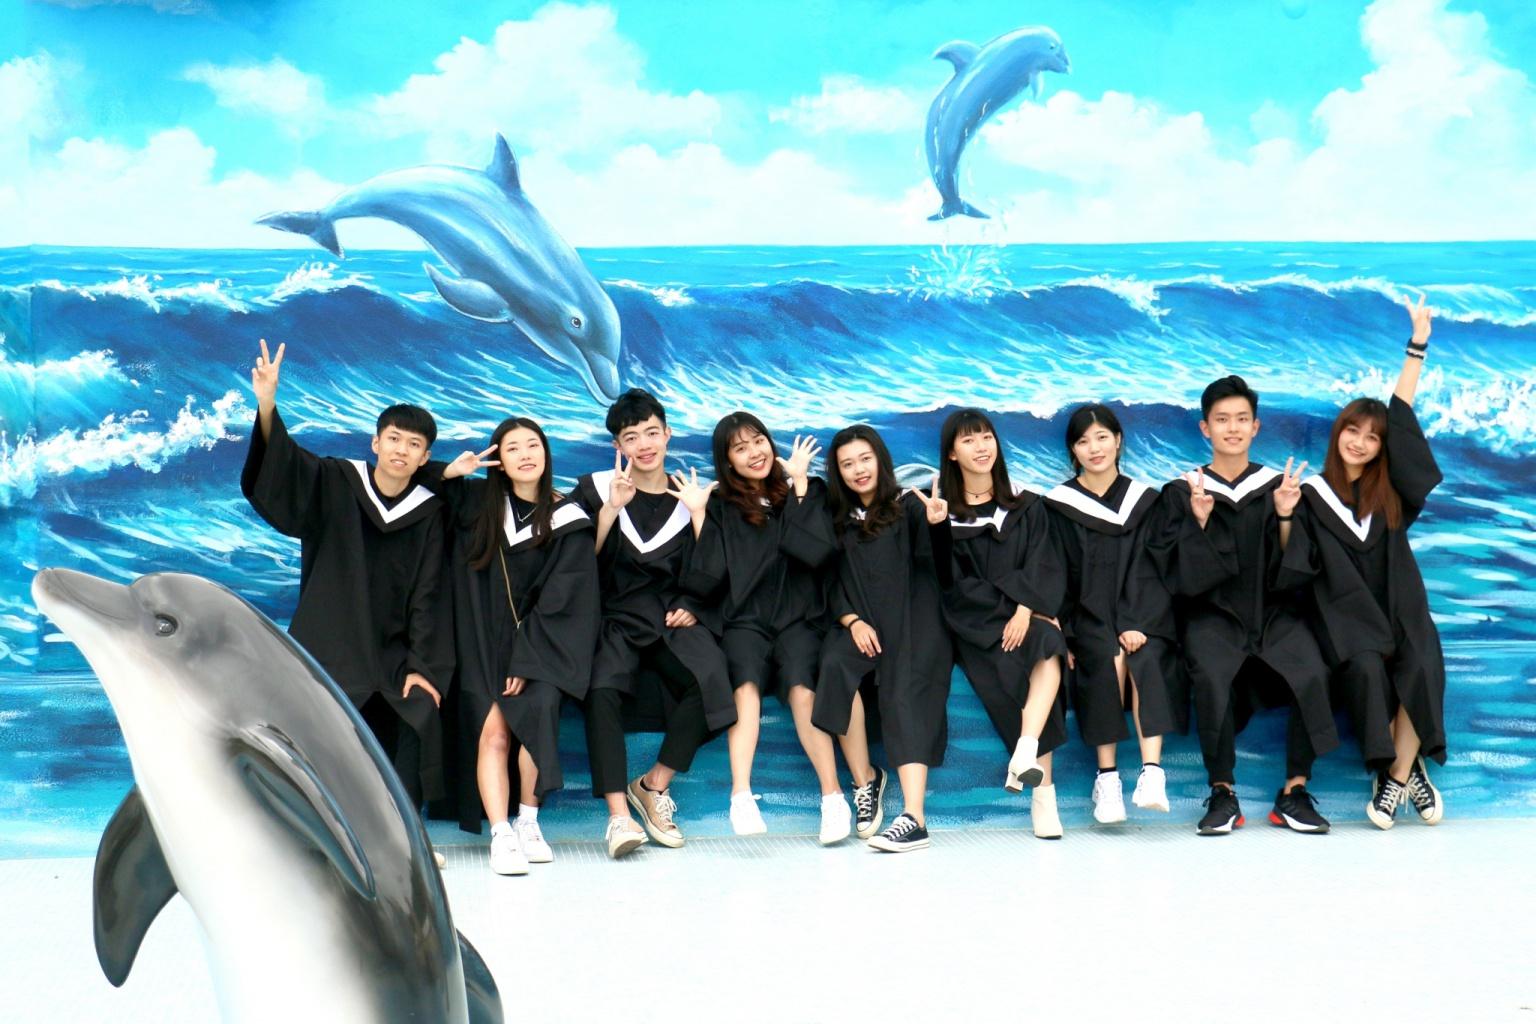 graduate (8).jpg (448 KB)